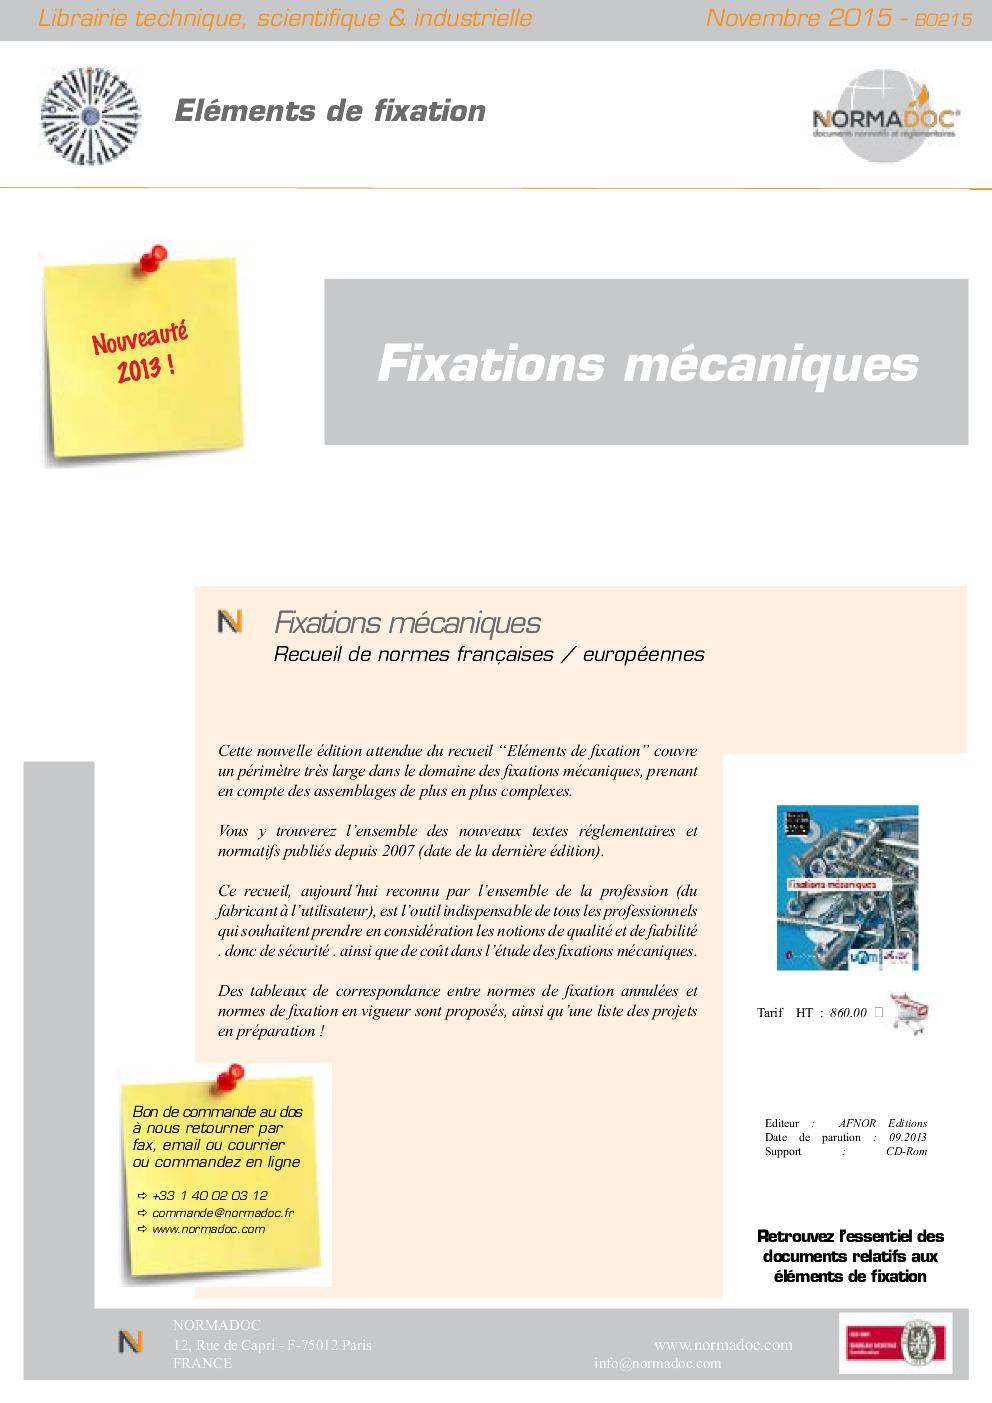 Fasteners / Eléments de Fixation